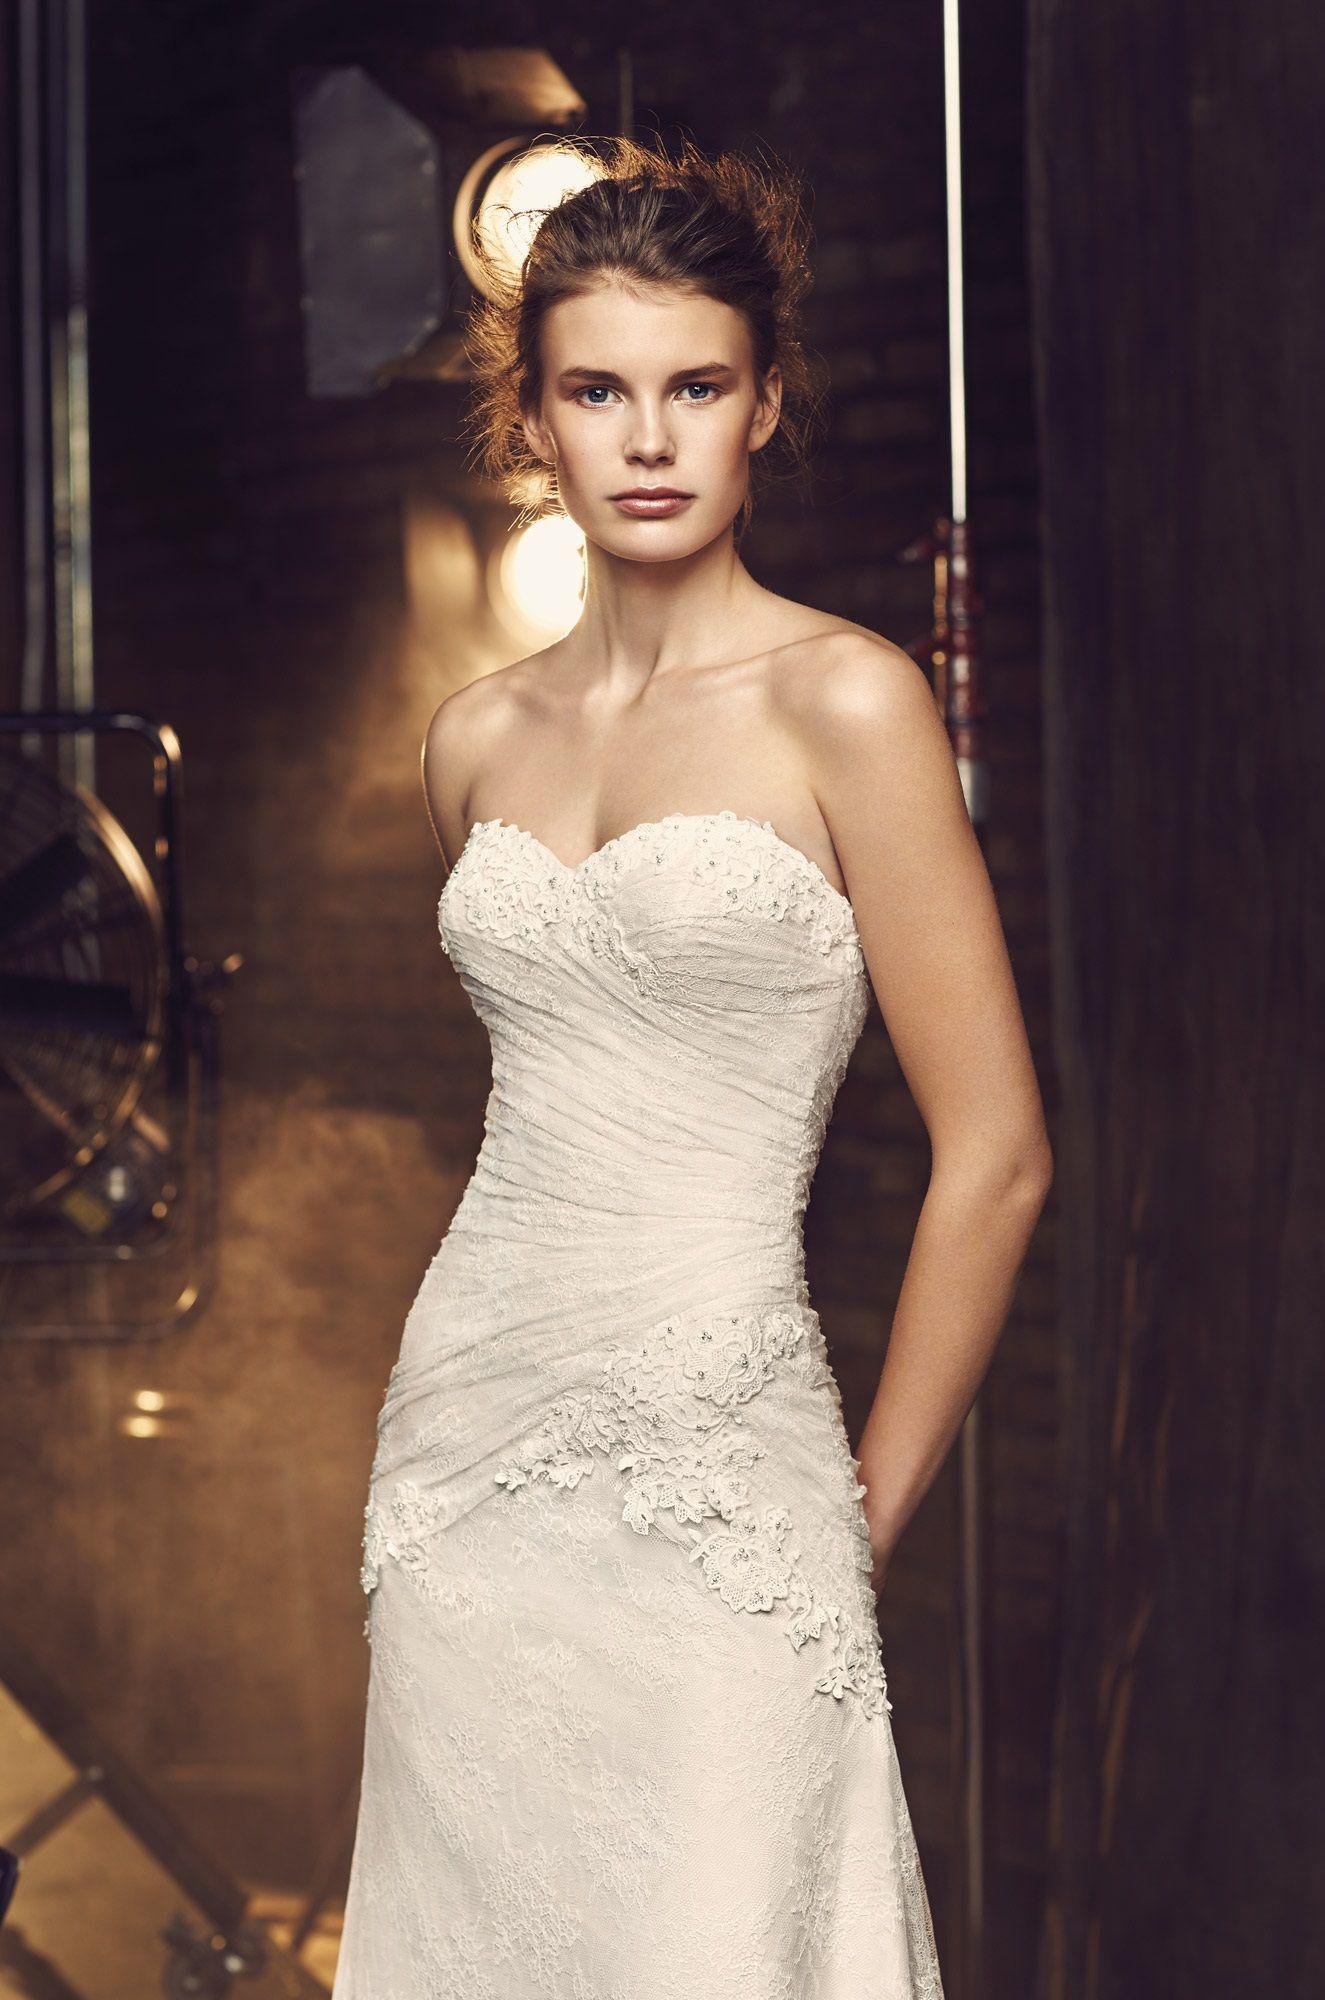 Asymmetrical lace wedding dress style mikaella bridal my